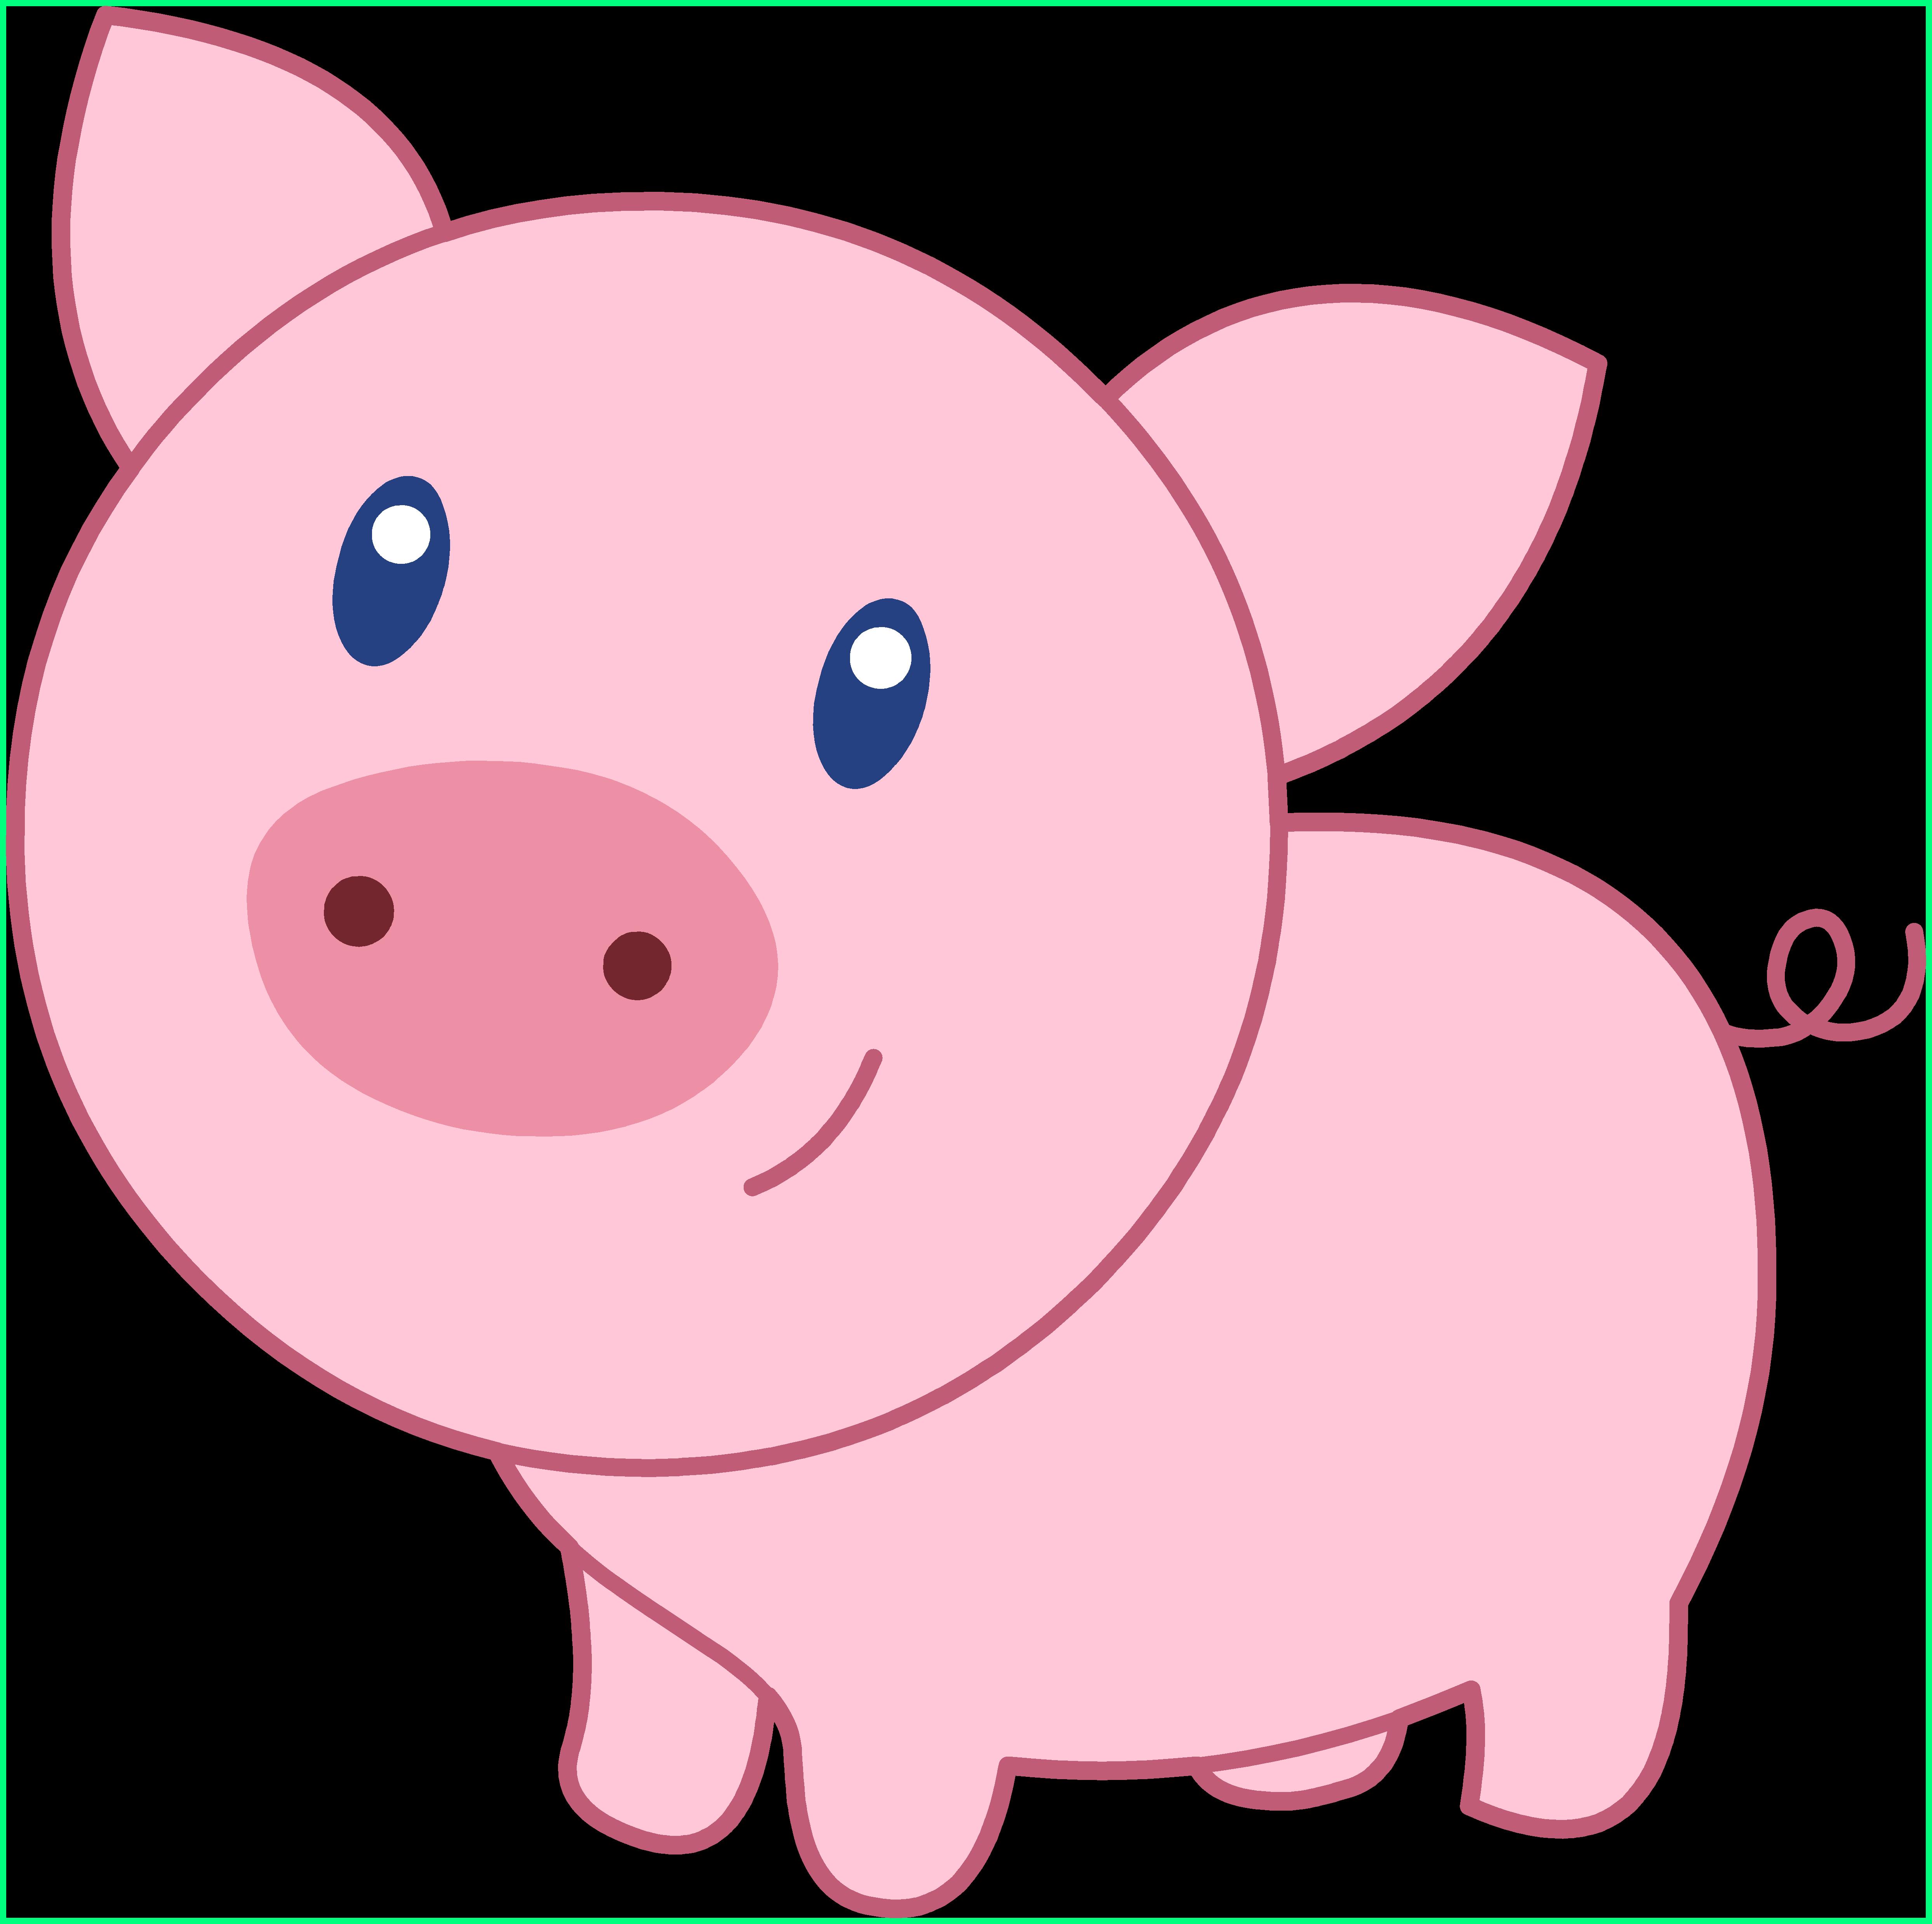 Pin By Olga Strelcova On Dlya Animacii Pig Pictures Pig Clipart Pig Cartoon